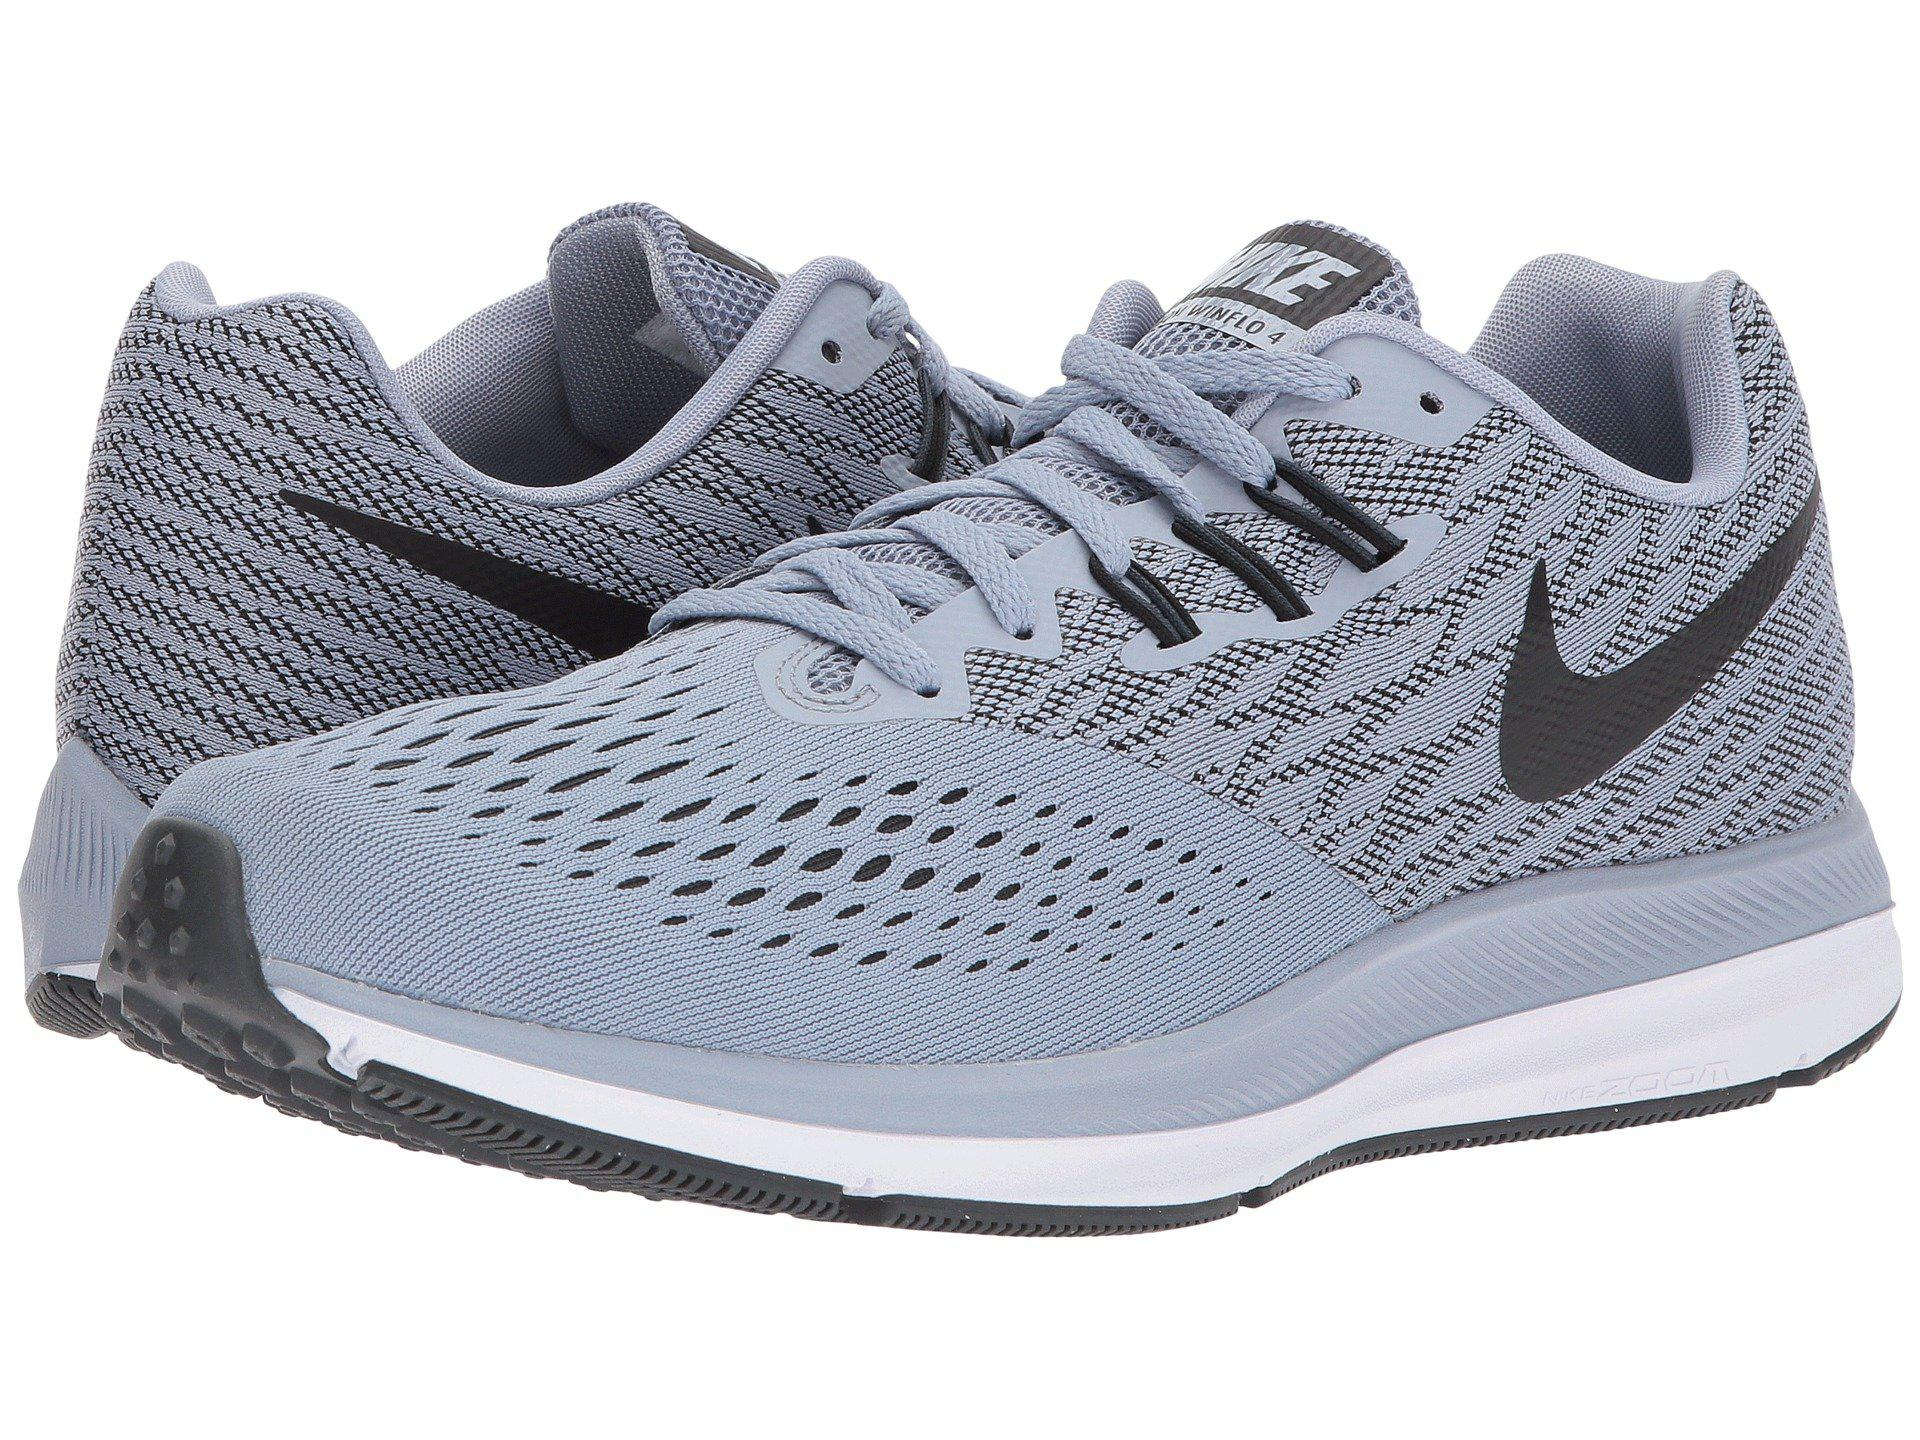 eaef1c57c18df Lyst - Nike Zoom Winflo 4 (pure Platinum black hyper Royal white ...